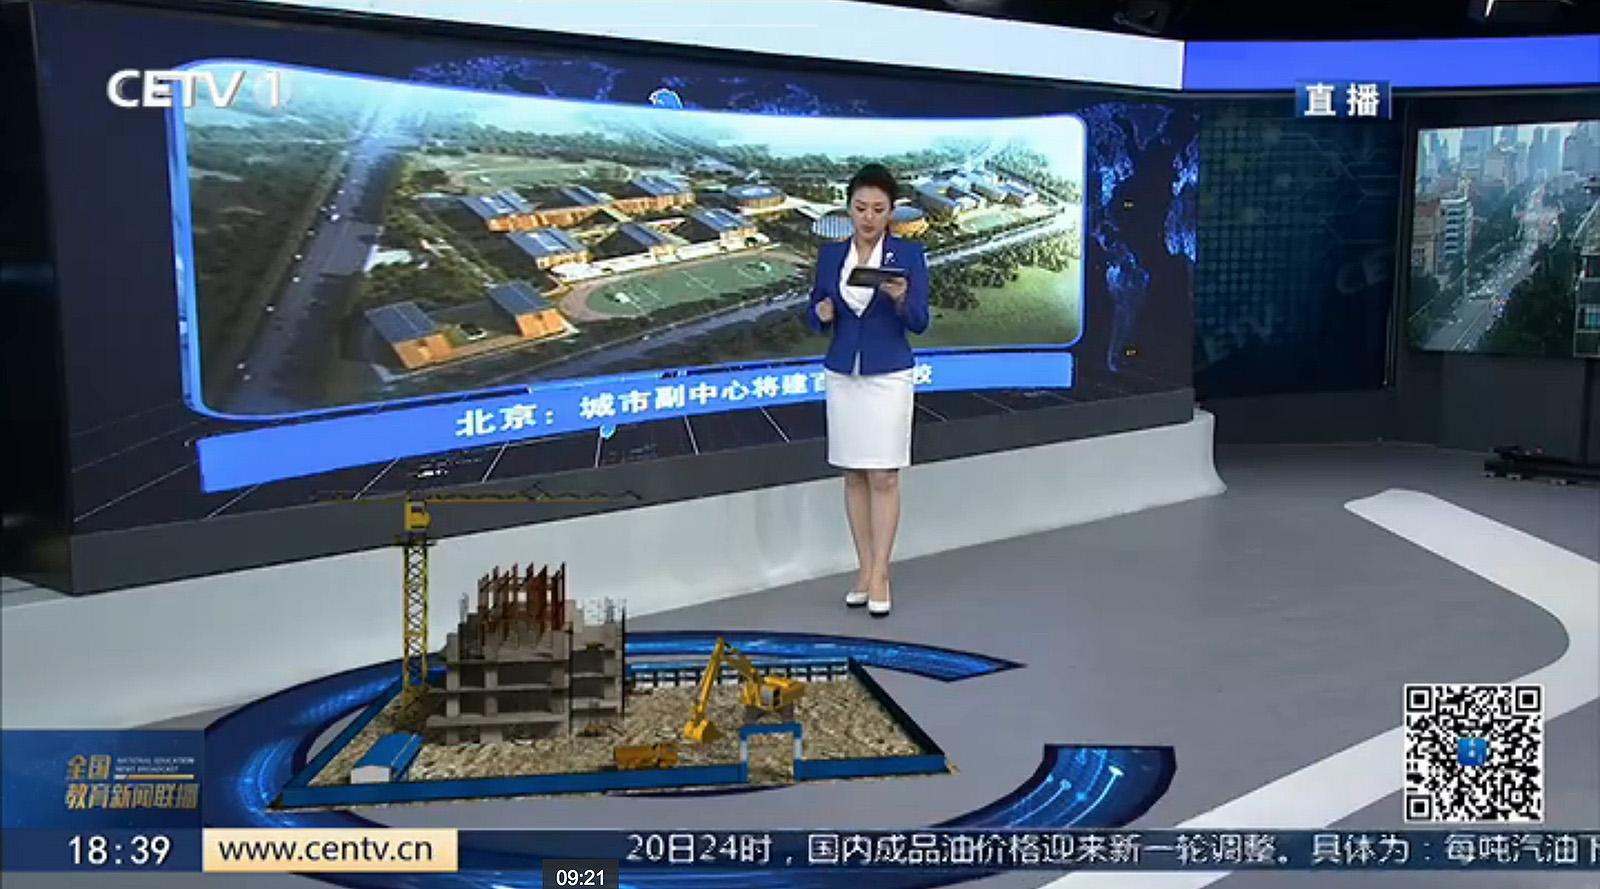 ncs_China-Education-Network-Television-Studio_0007